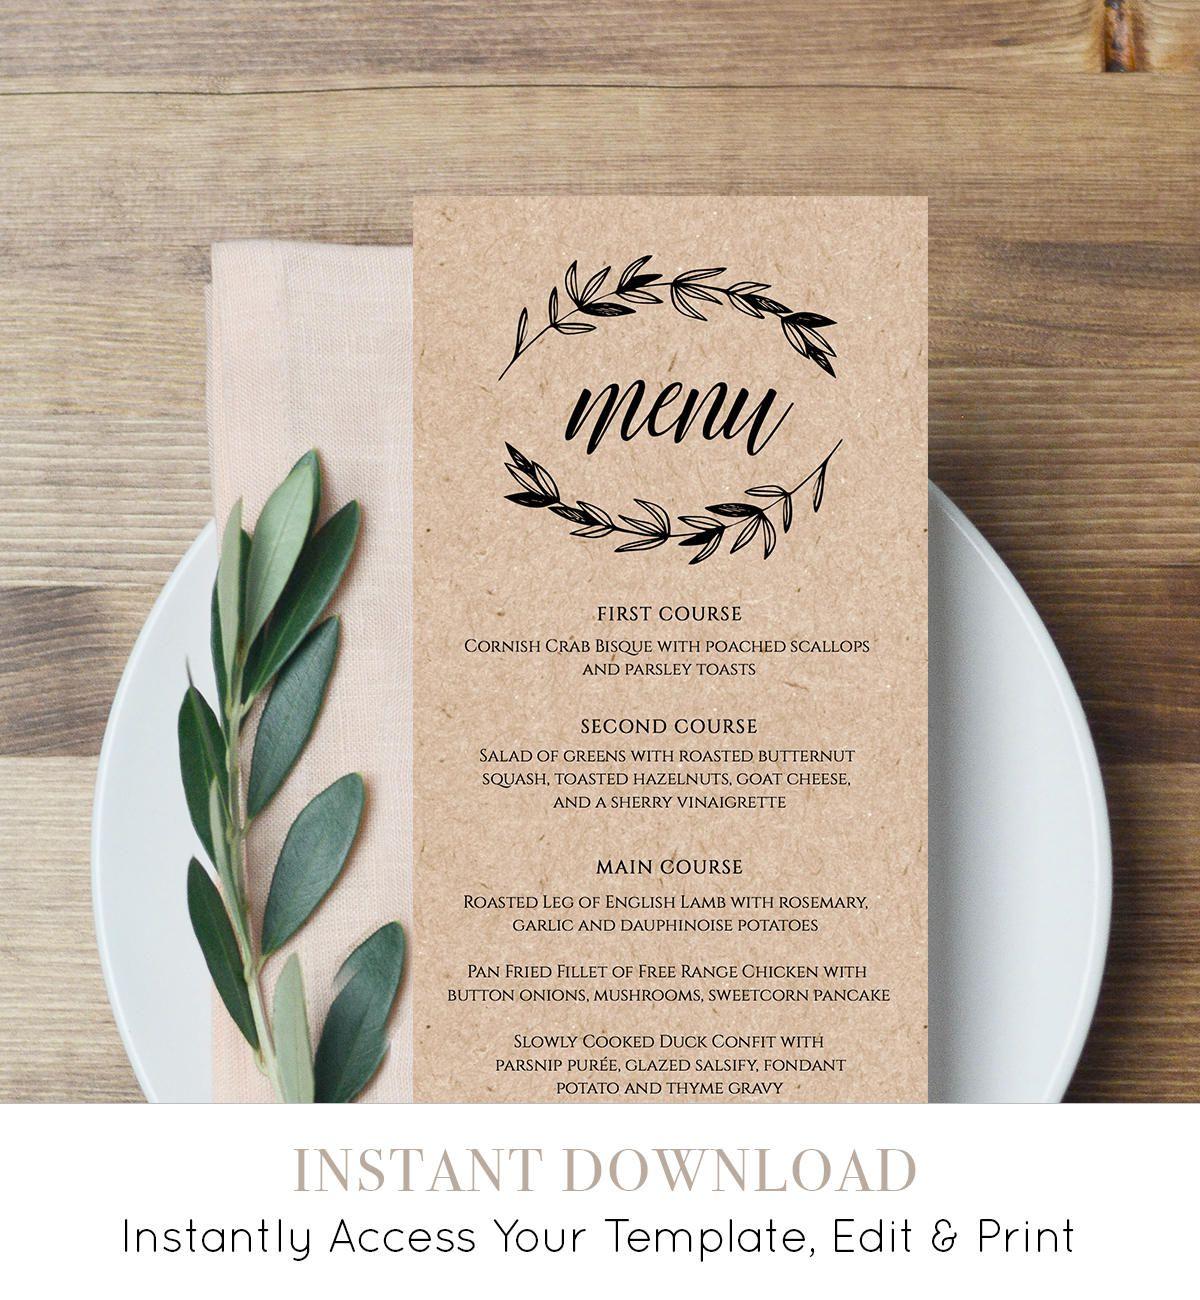 006 Unusual Free Printable Wedding Menu Card Template Design  TemplatesFull